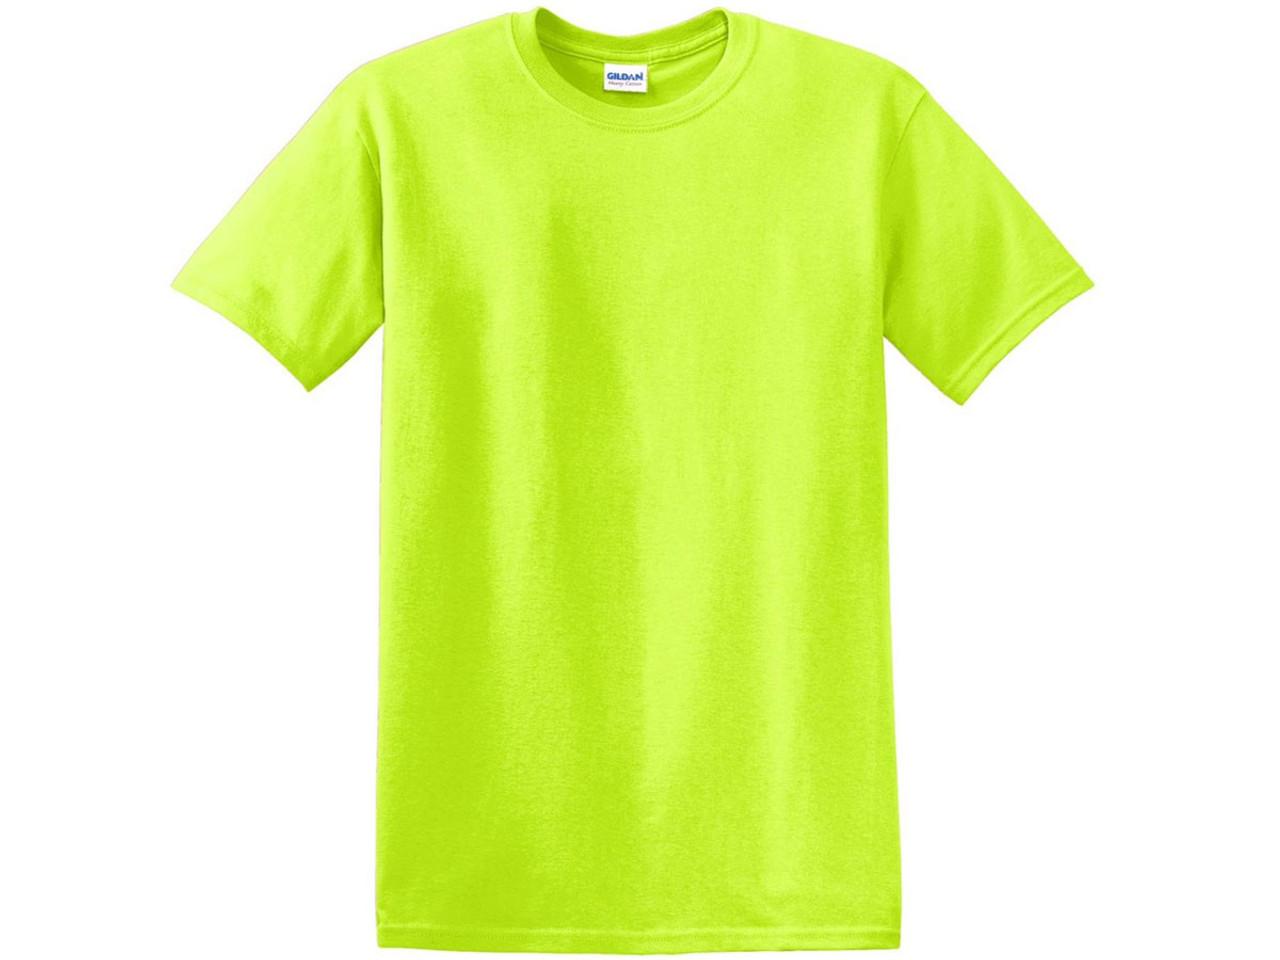 Blank T‑Shirts - Gildan G8000 Adult Unisex 5 5 oz , 50/50 Cotton/Poly (Neon  Safety Green, SM-3XL) - 4943